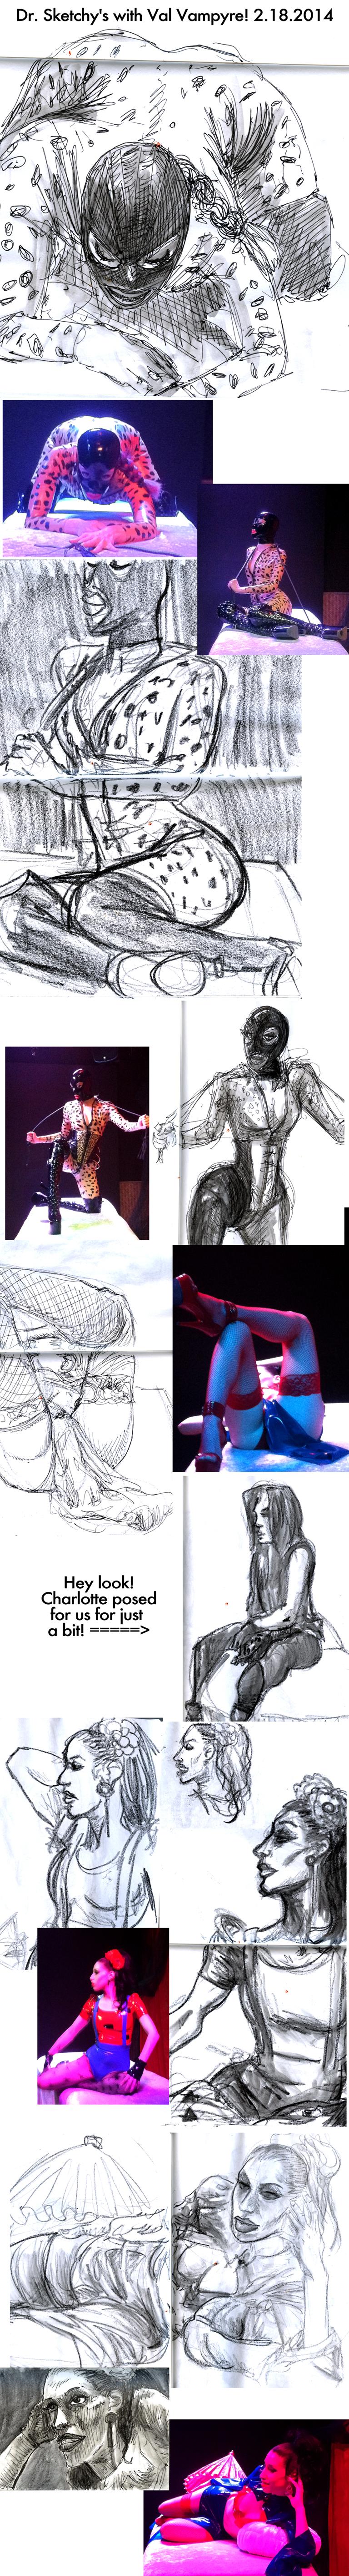 Dr-Sketchy-Composite